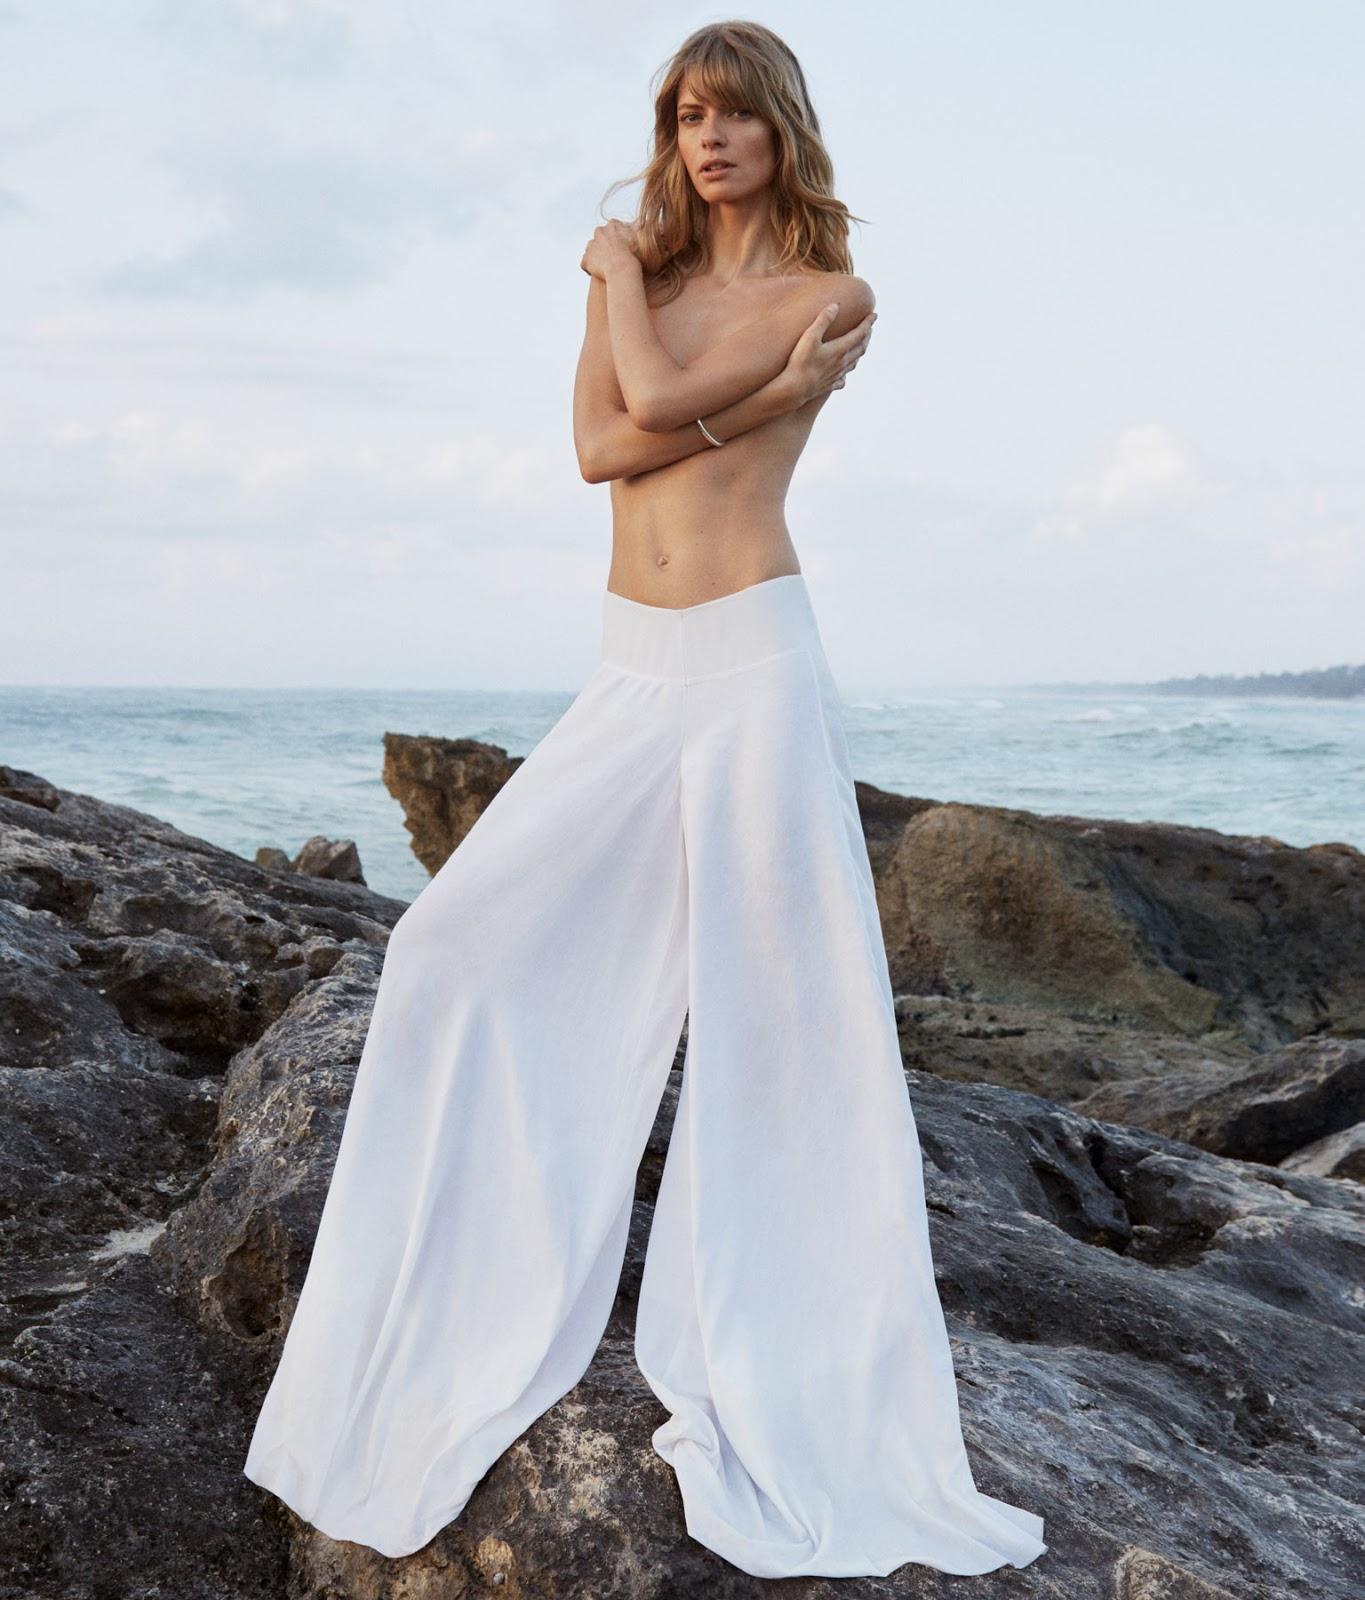 Fashion Editorial: Julia Stegner by Morgan Pilcher for Porter Magazine #21